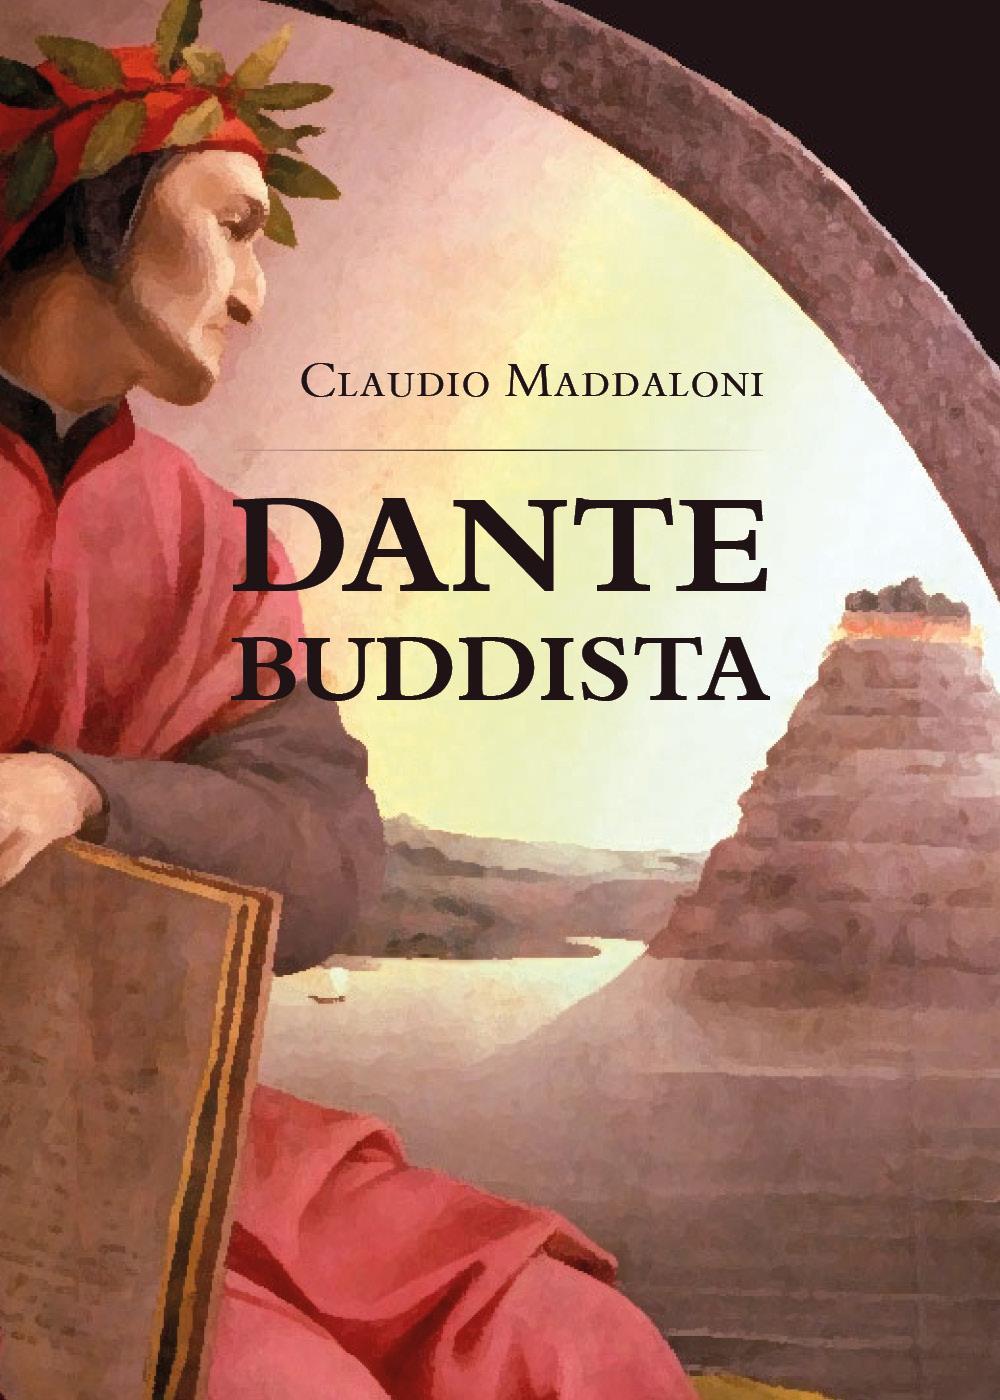 Dante buddista